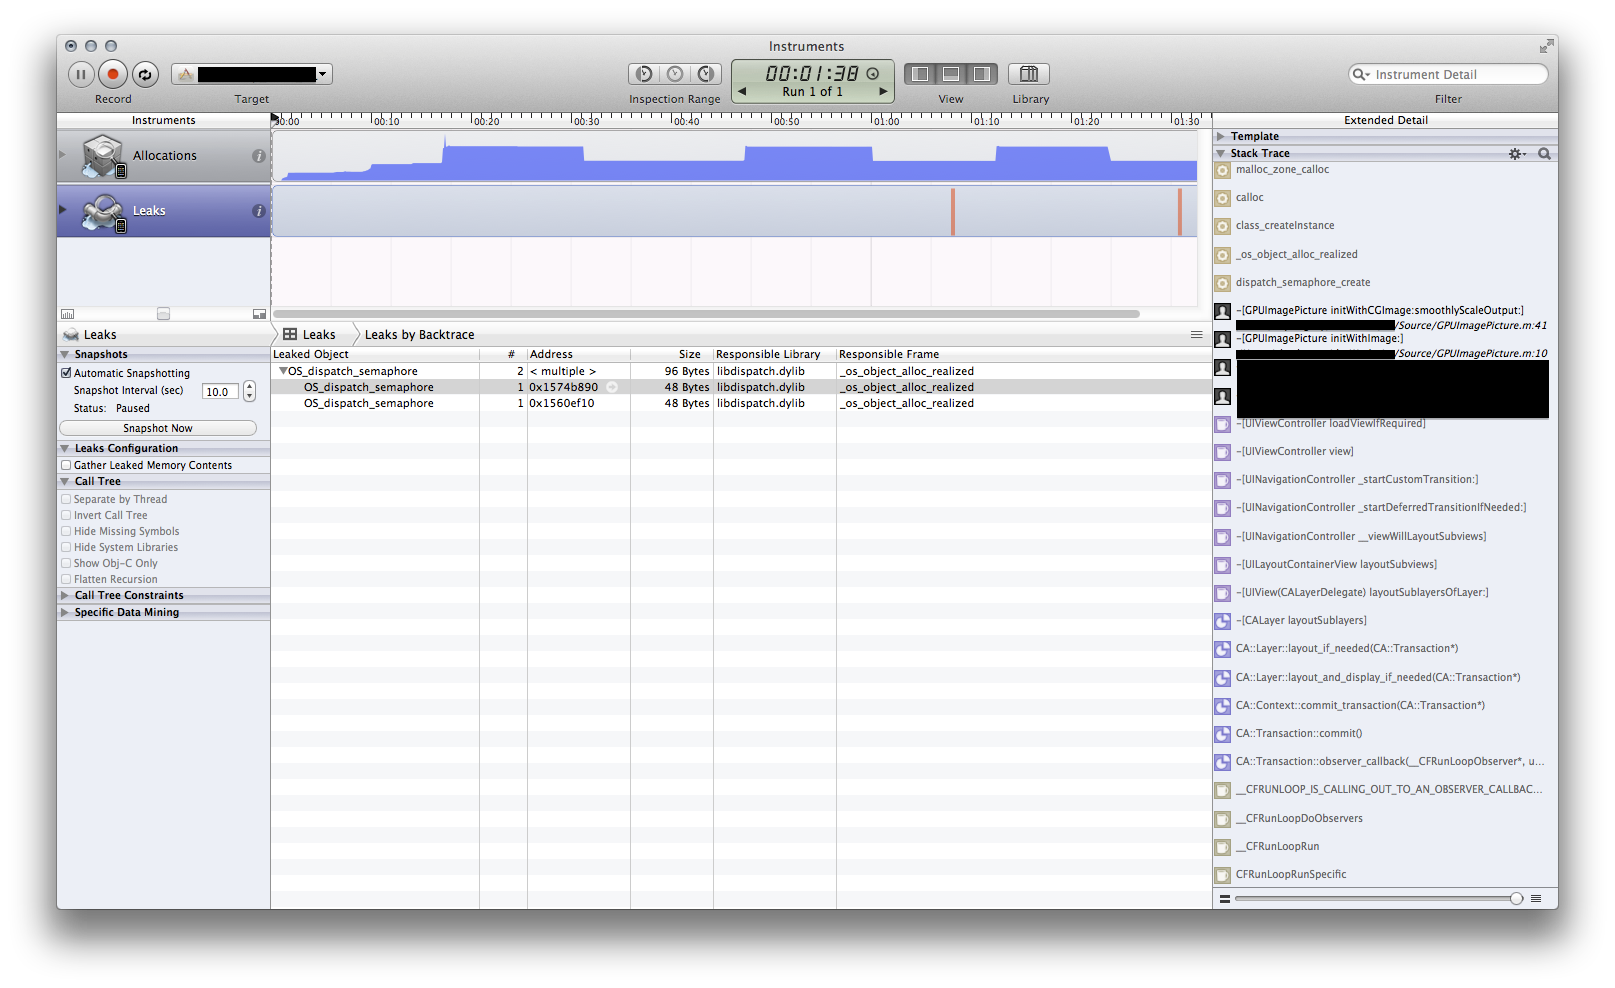 screenshot 2013-10-06 18 21 06